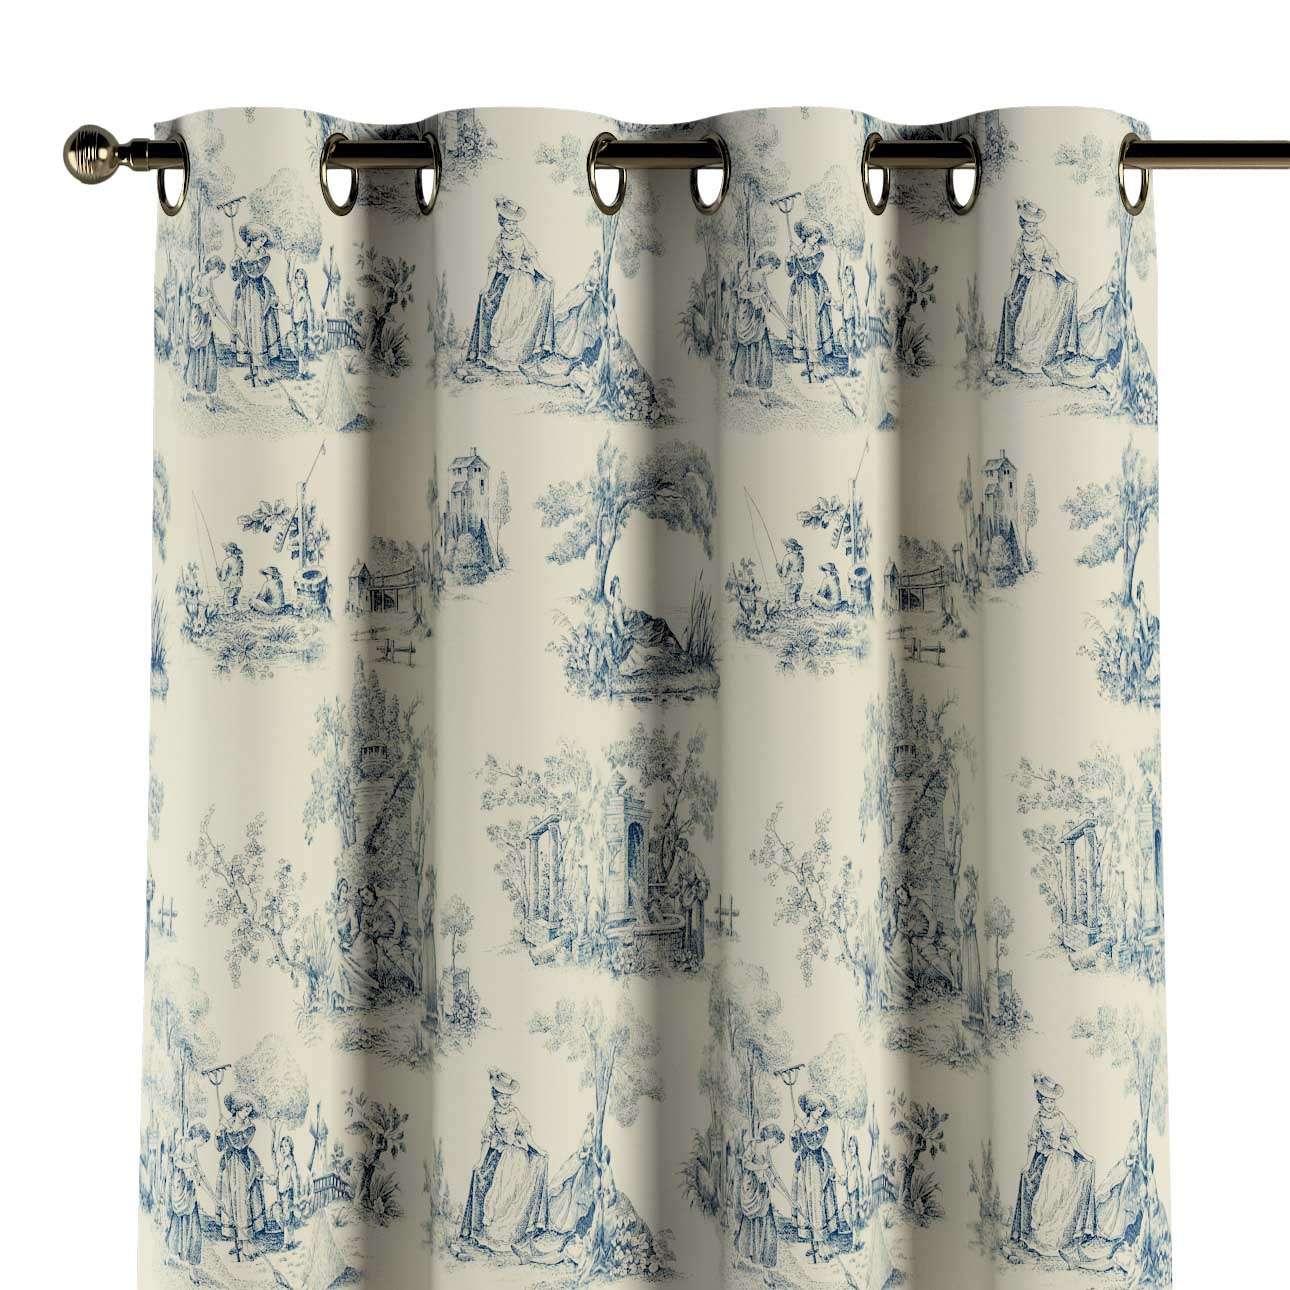 Eyelet curtain in collection Avinon, fabric: 132-66